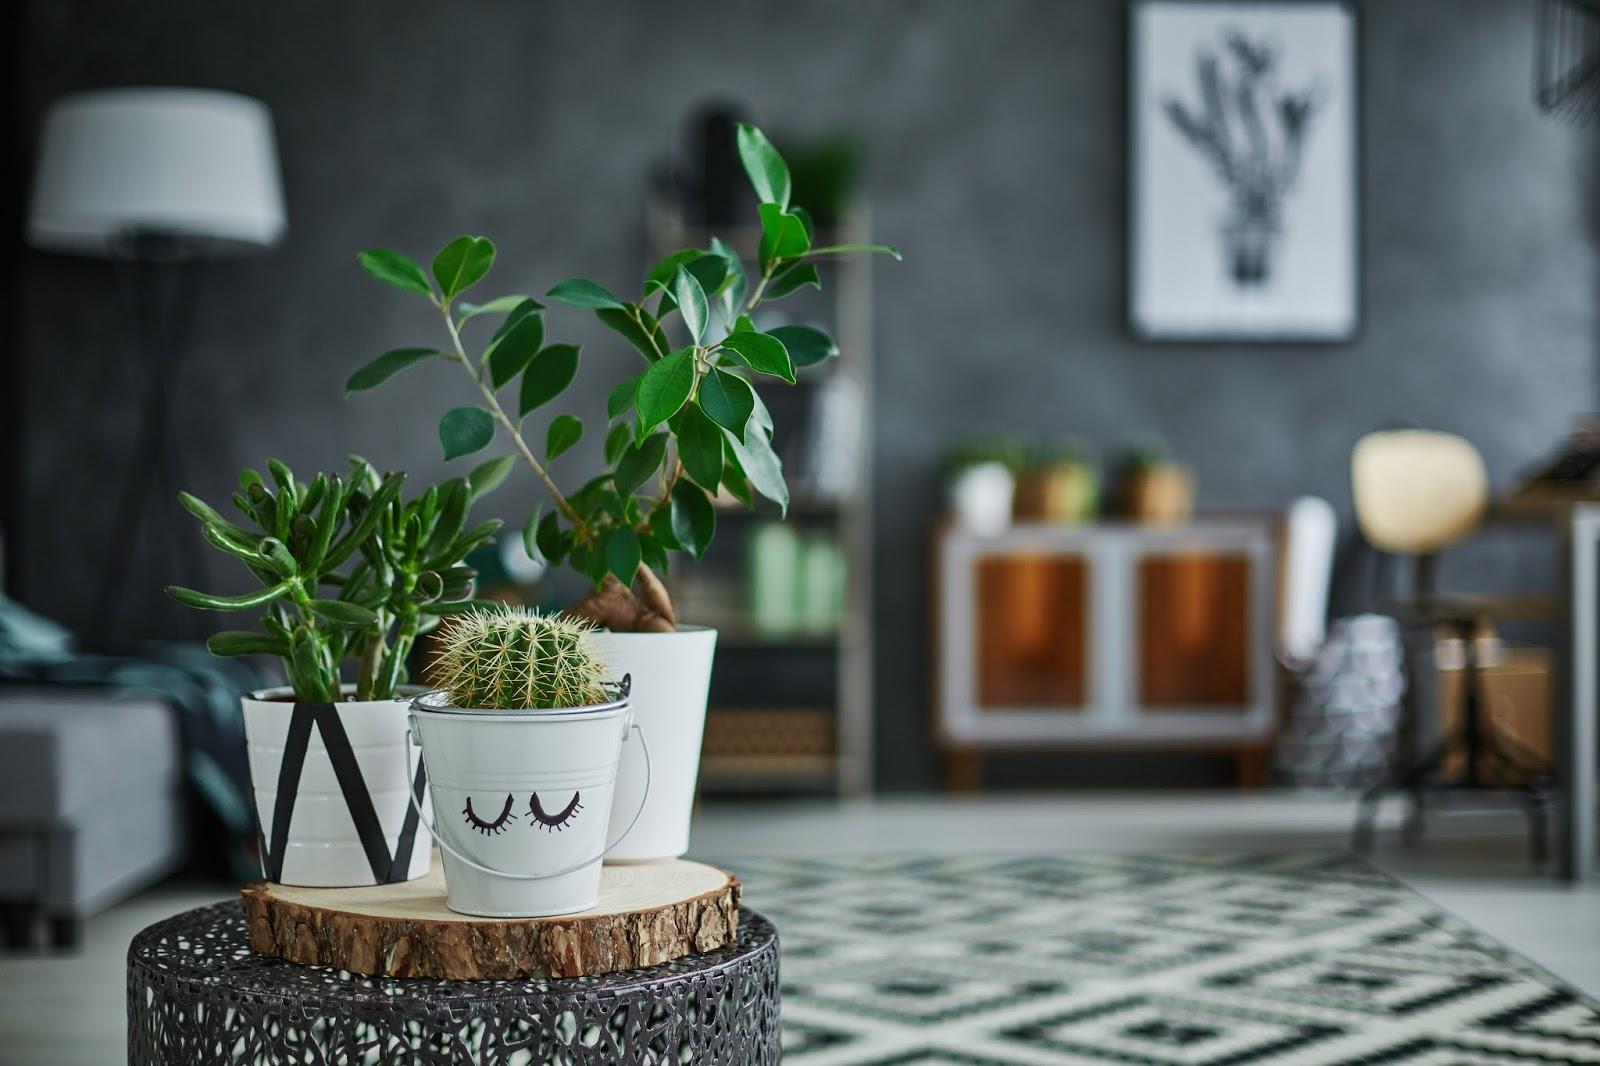 kamerplanten weinig verzorging